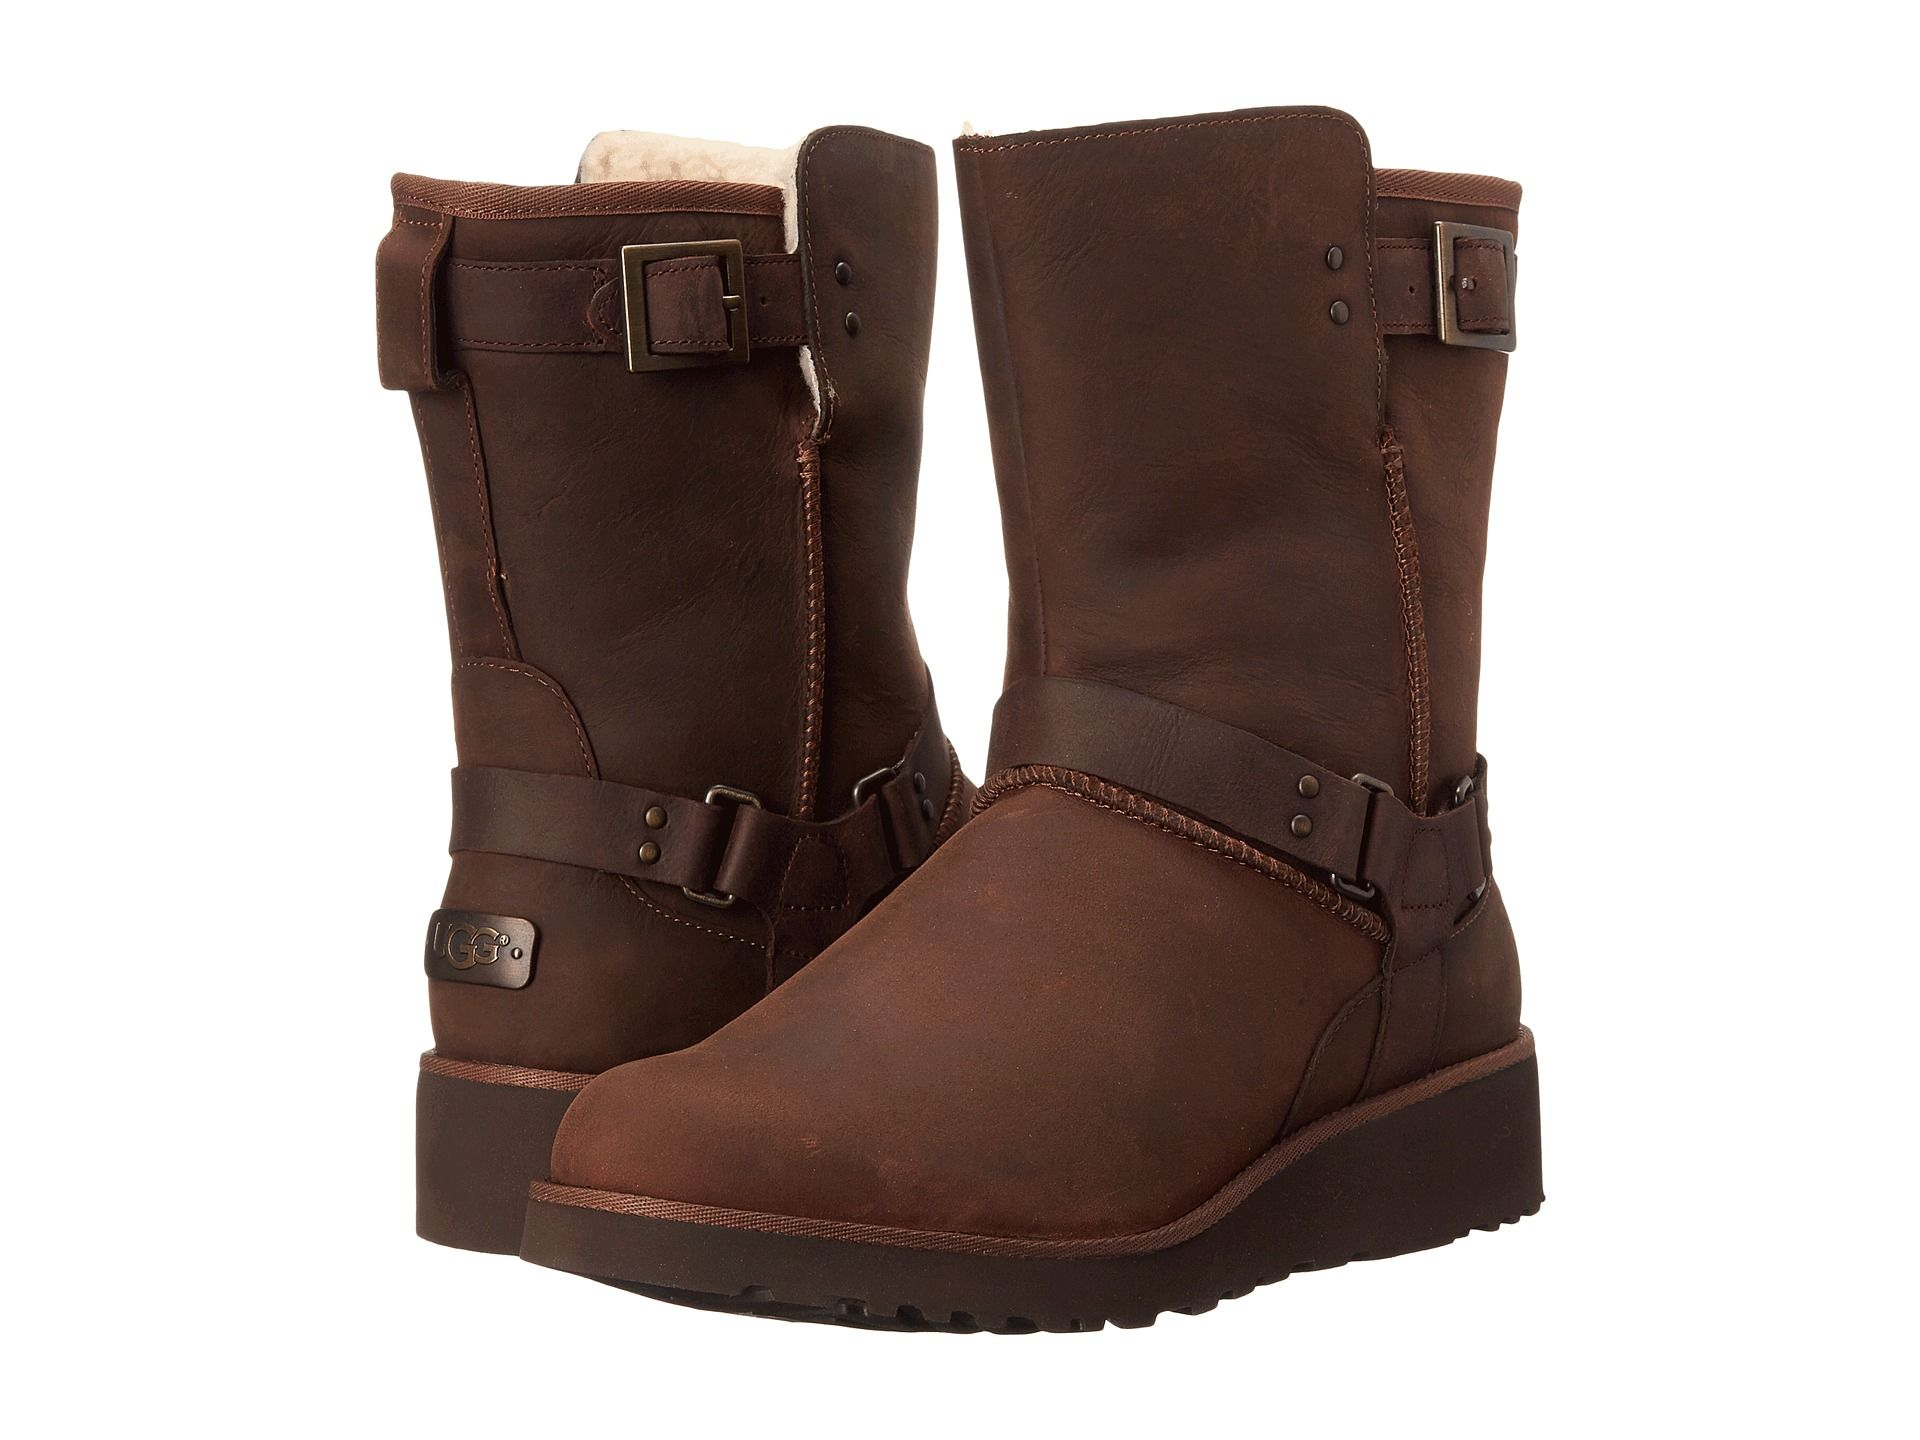 Womens Boots UGG Maddox Chocolate Satin